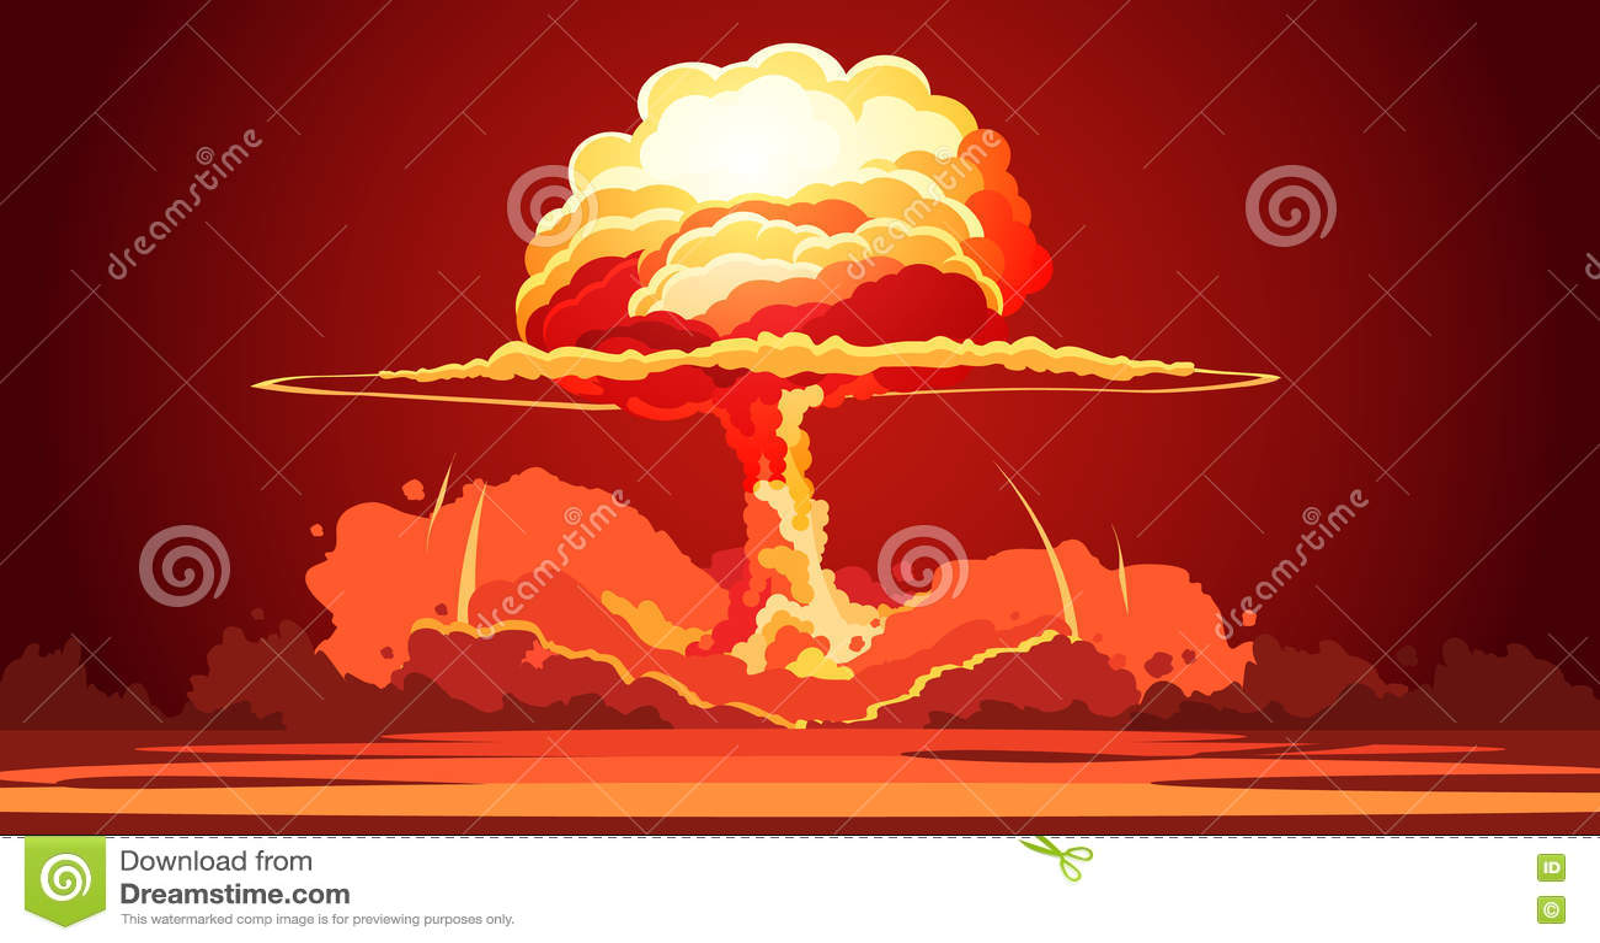 nuclear explosion mushroom cloud retro poster stock vector fireball clip art fire hall clip art